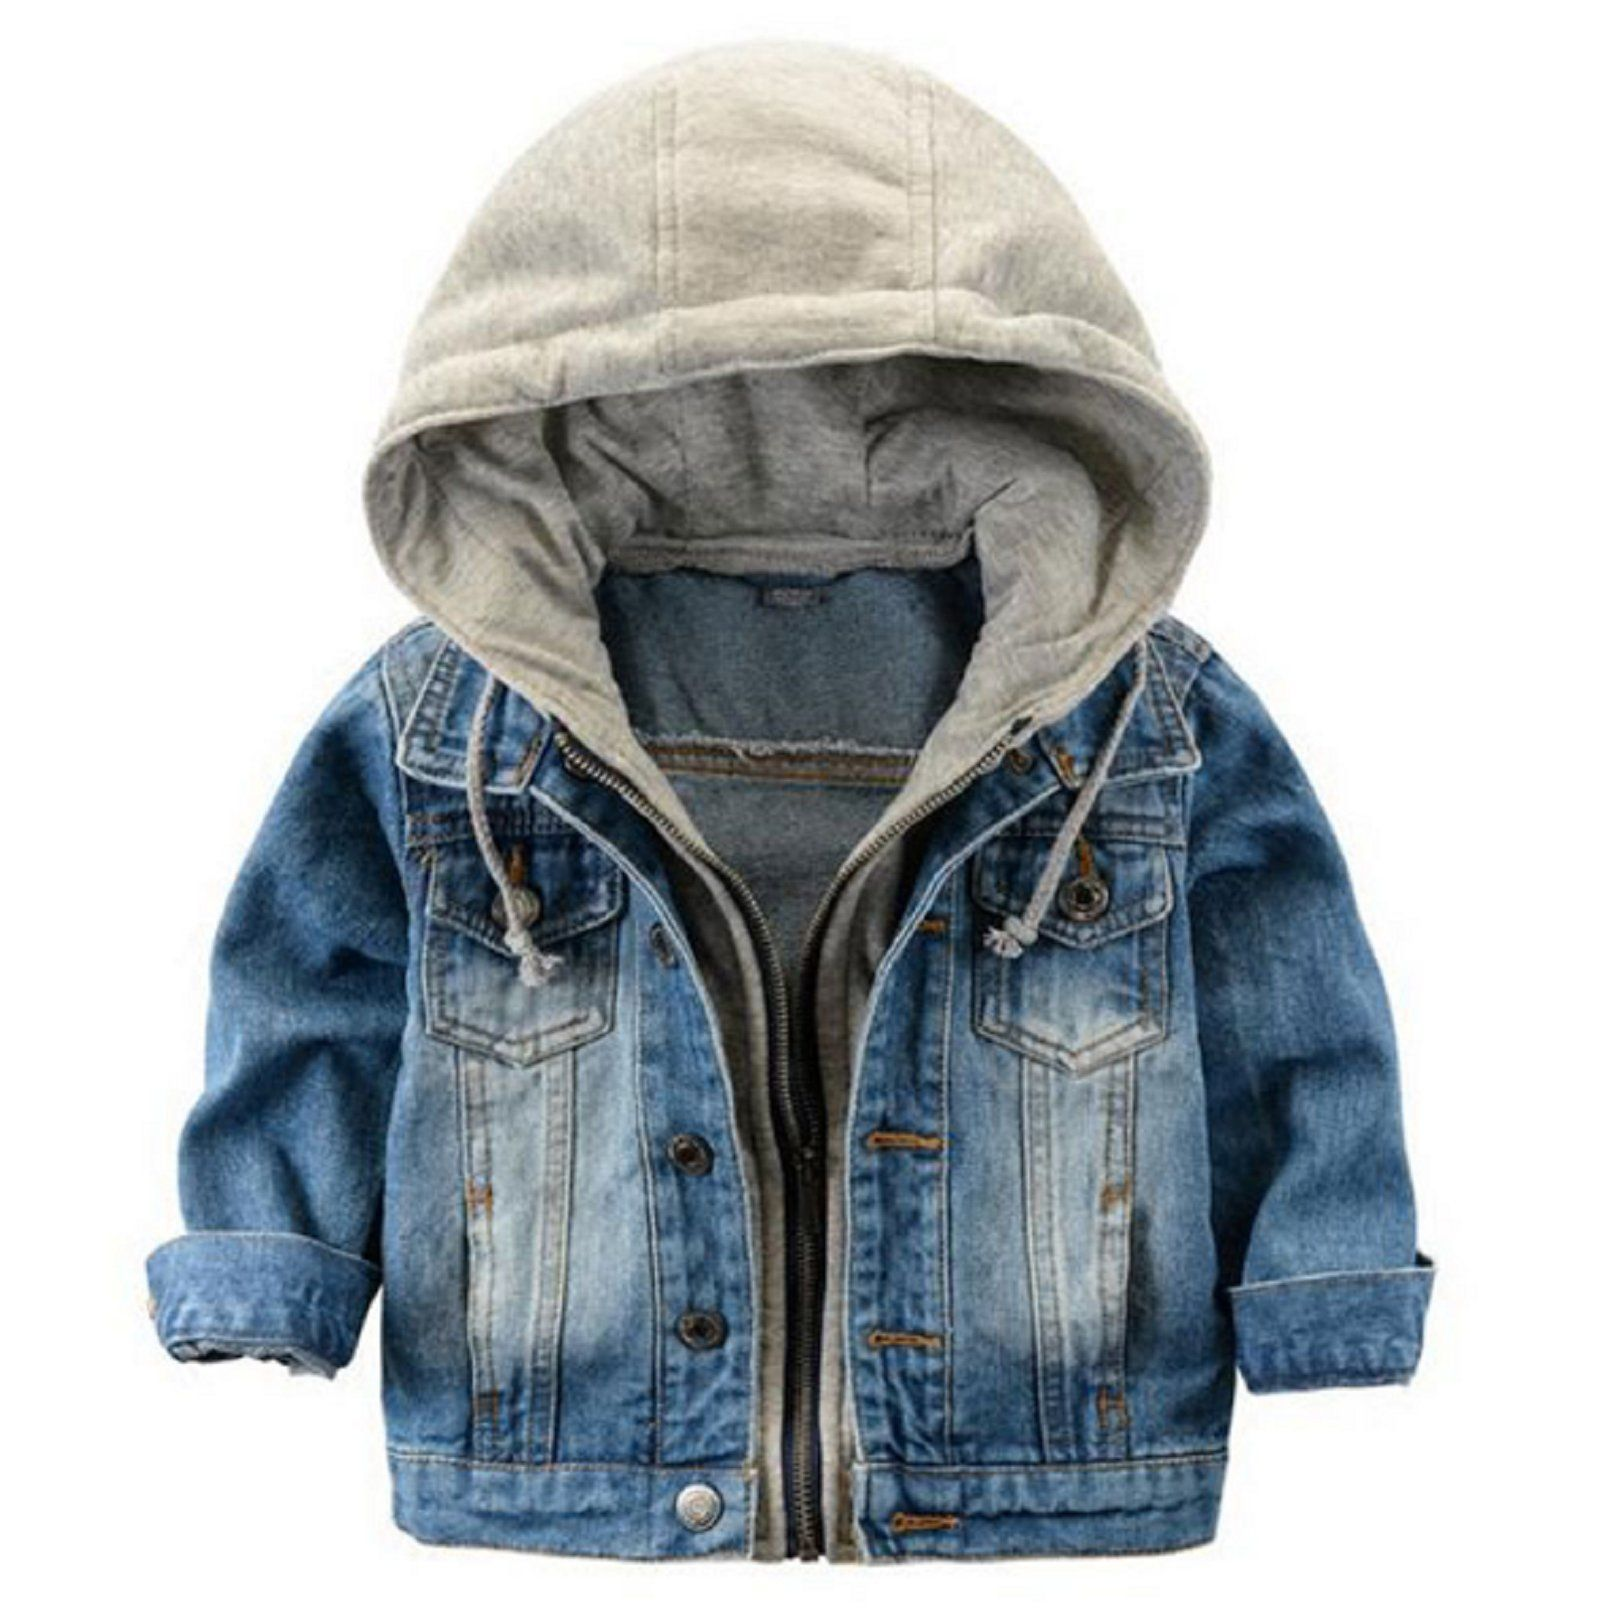 36fec6a52 Hot Sale! Fashion Denim baby Boys Children outerwear coat fashion ...